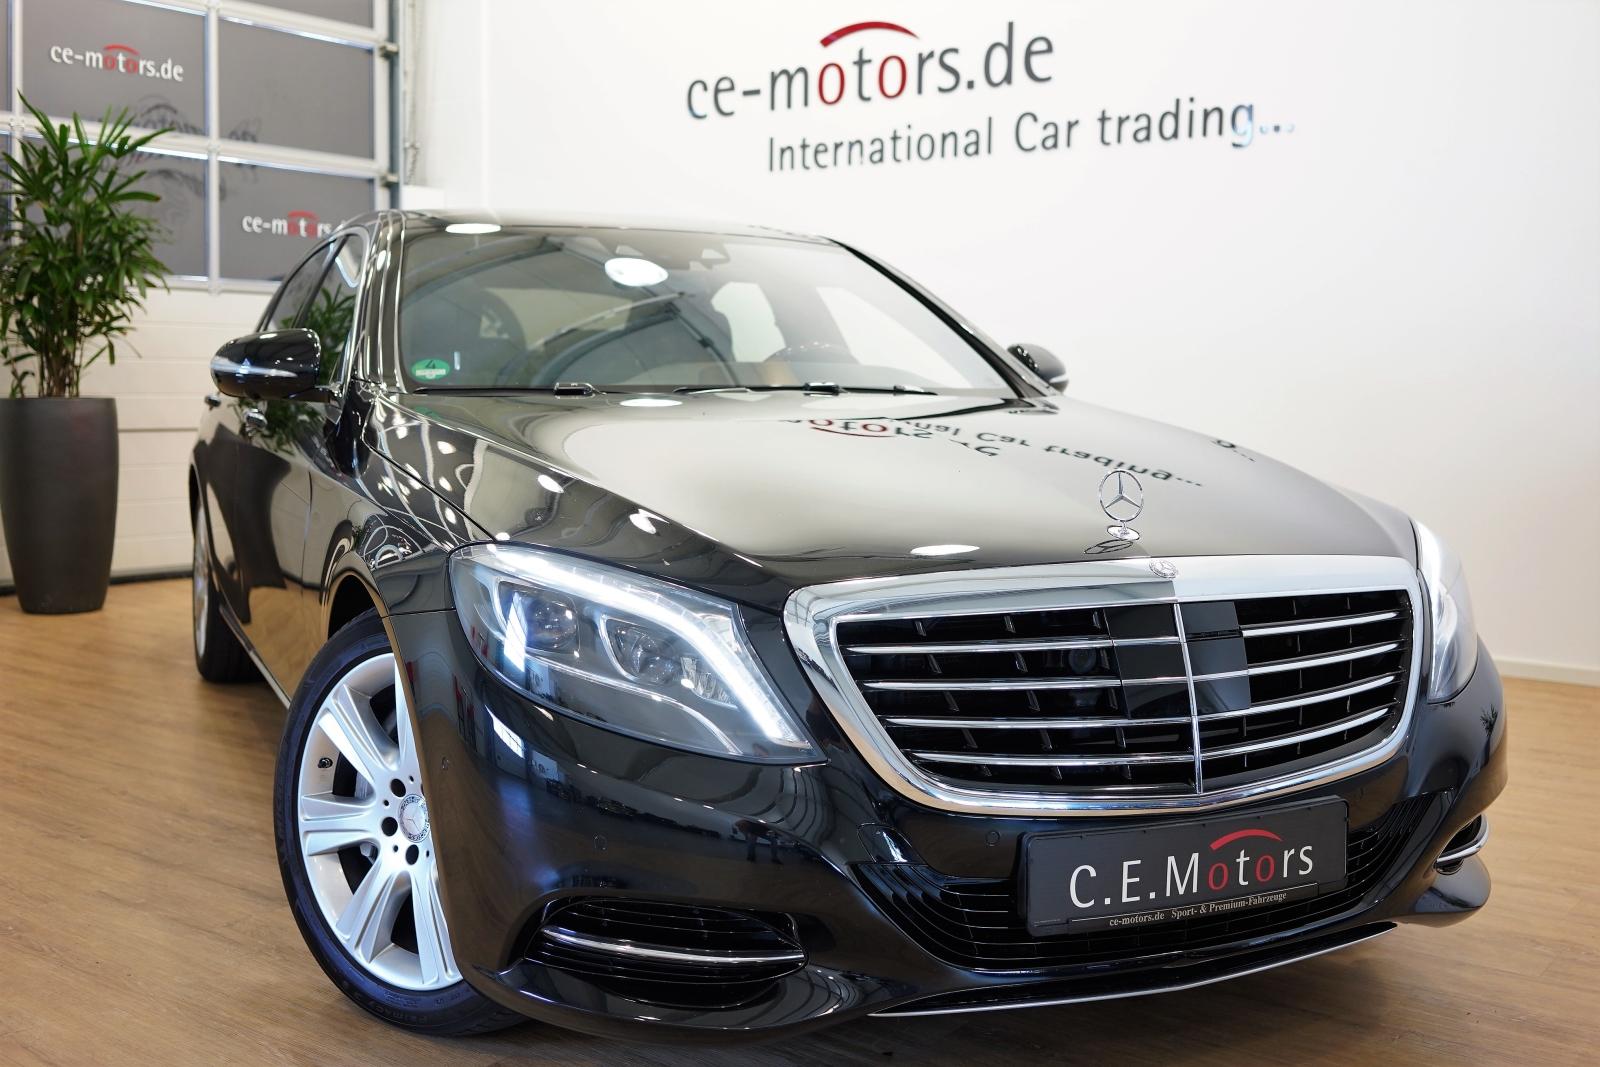 Mercedes-Benz S 500 Lang 4M Ind.Ent*Pano*Fahrass*Burmester*LED, Jahr 2014, Benzin